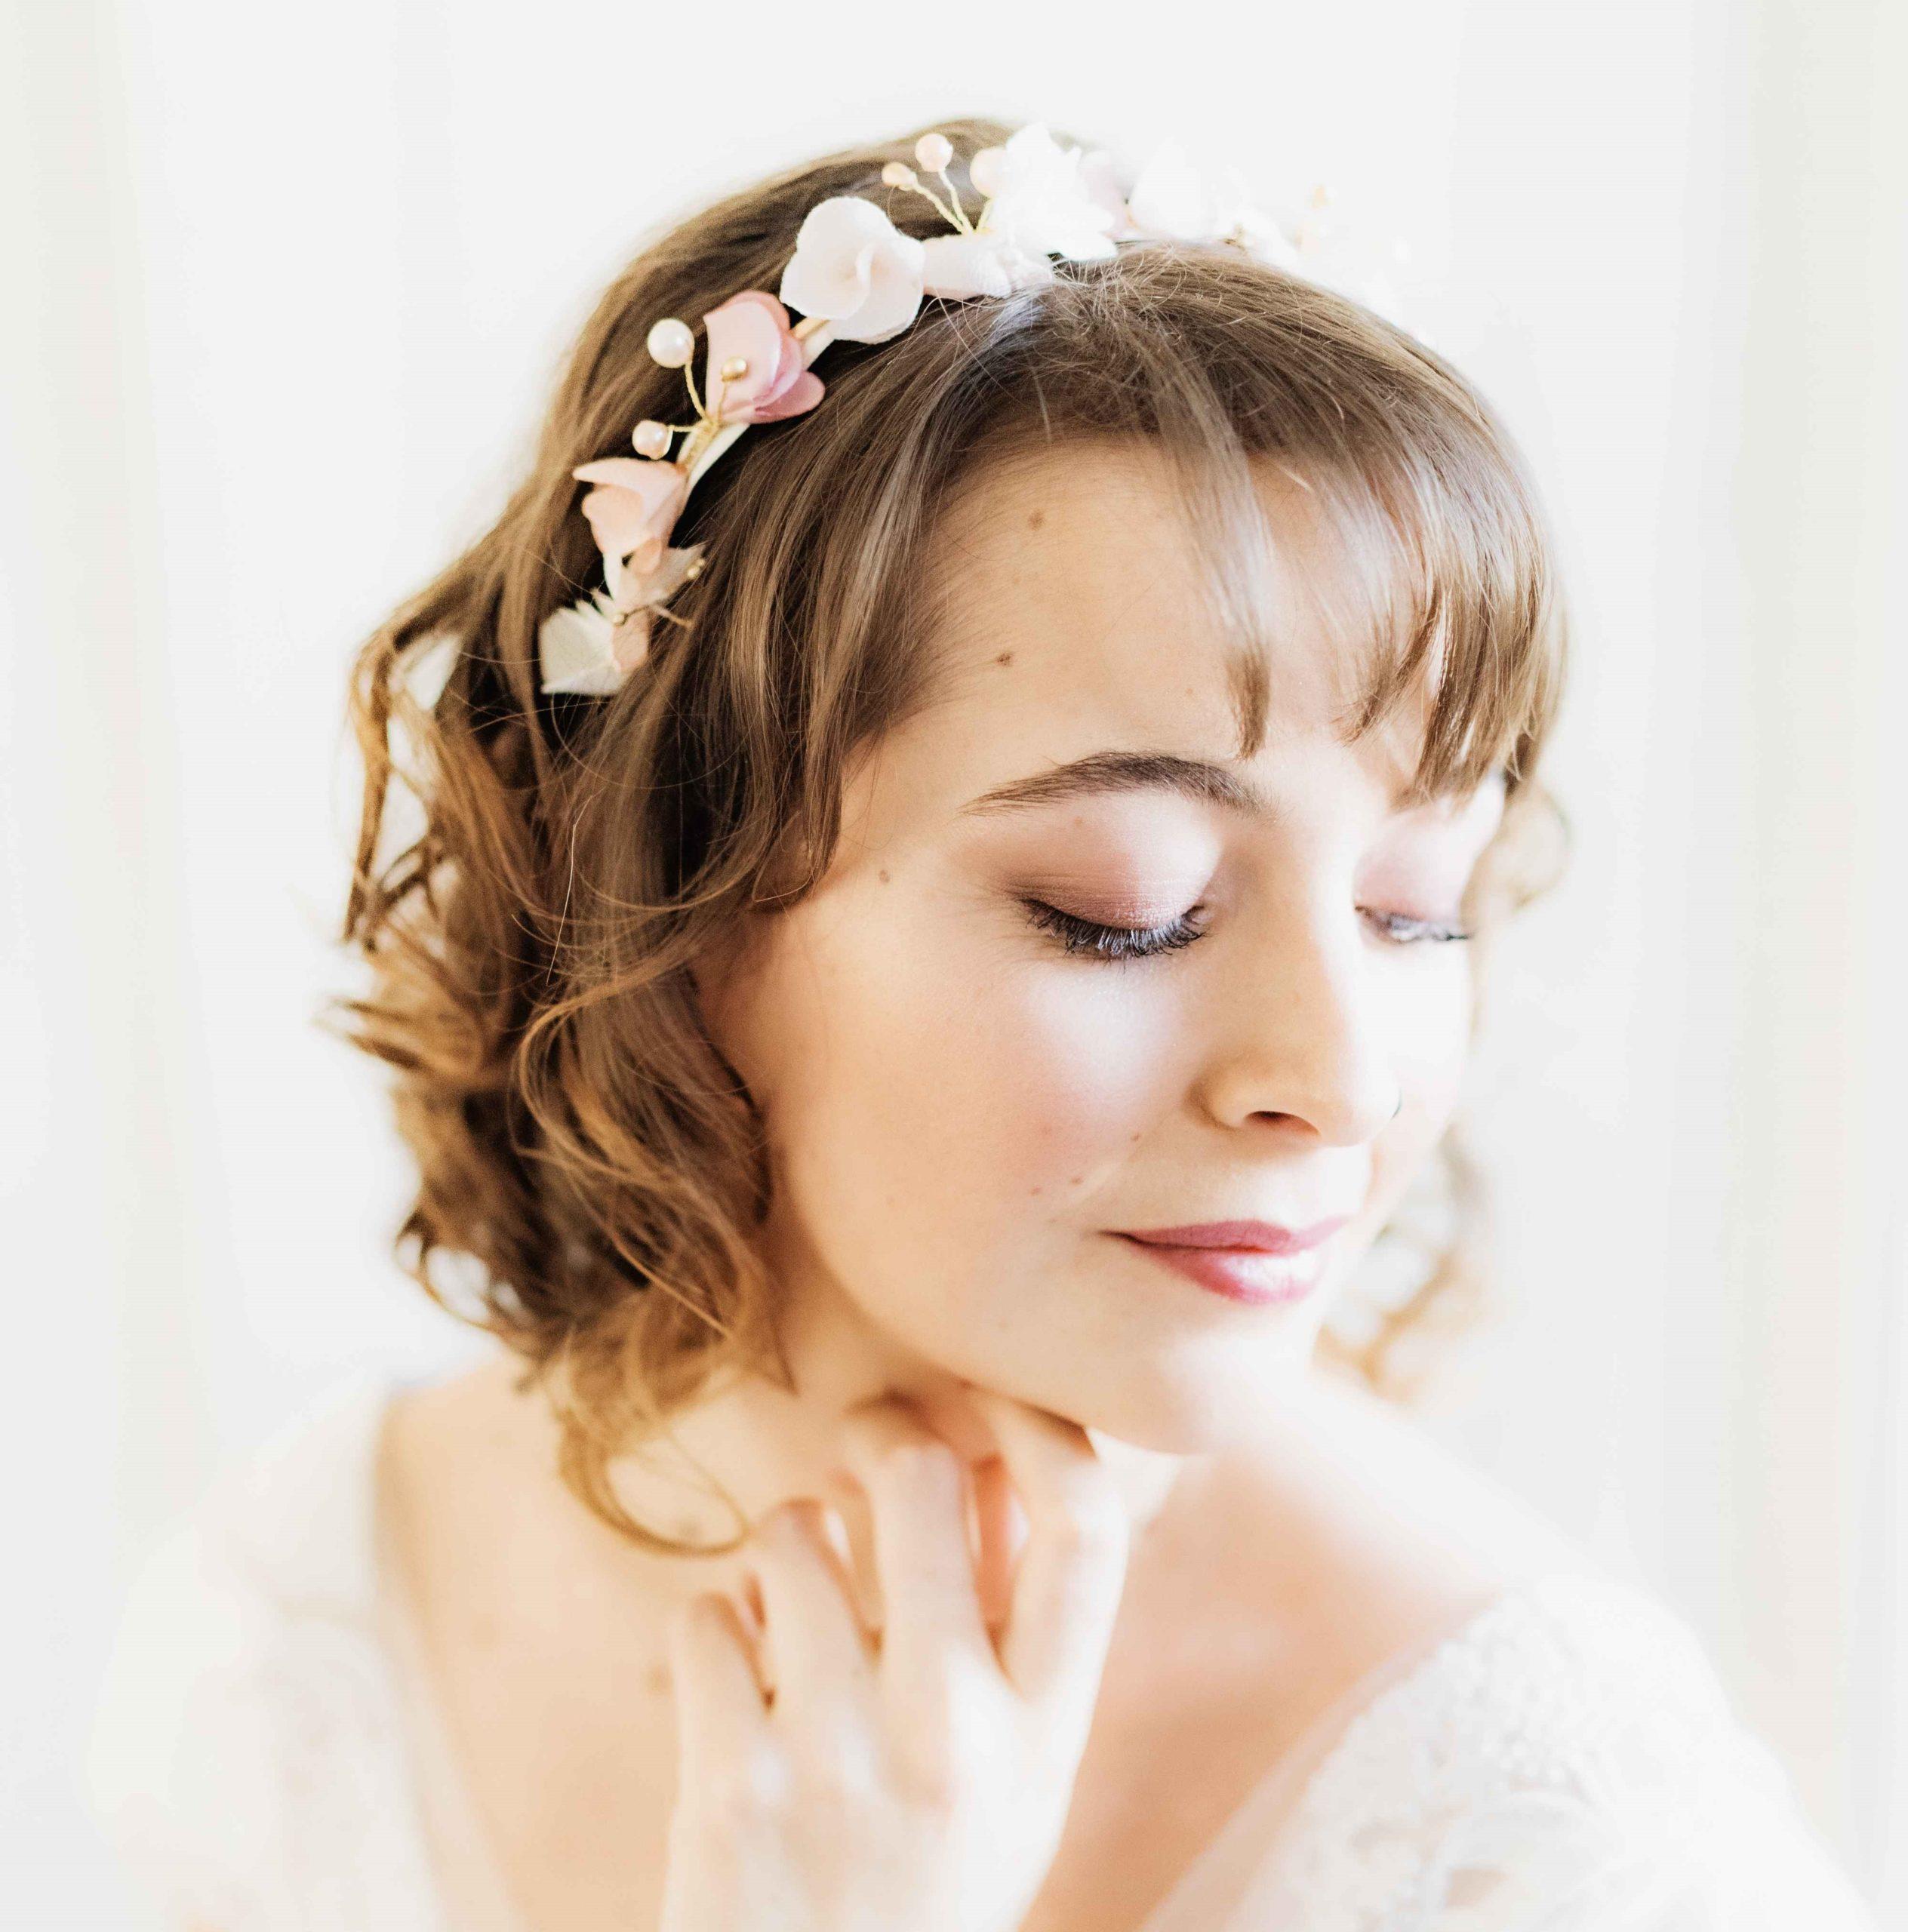 Couronne Bertille 3 Alice Marty - Couture florale Accessoires Mariage